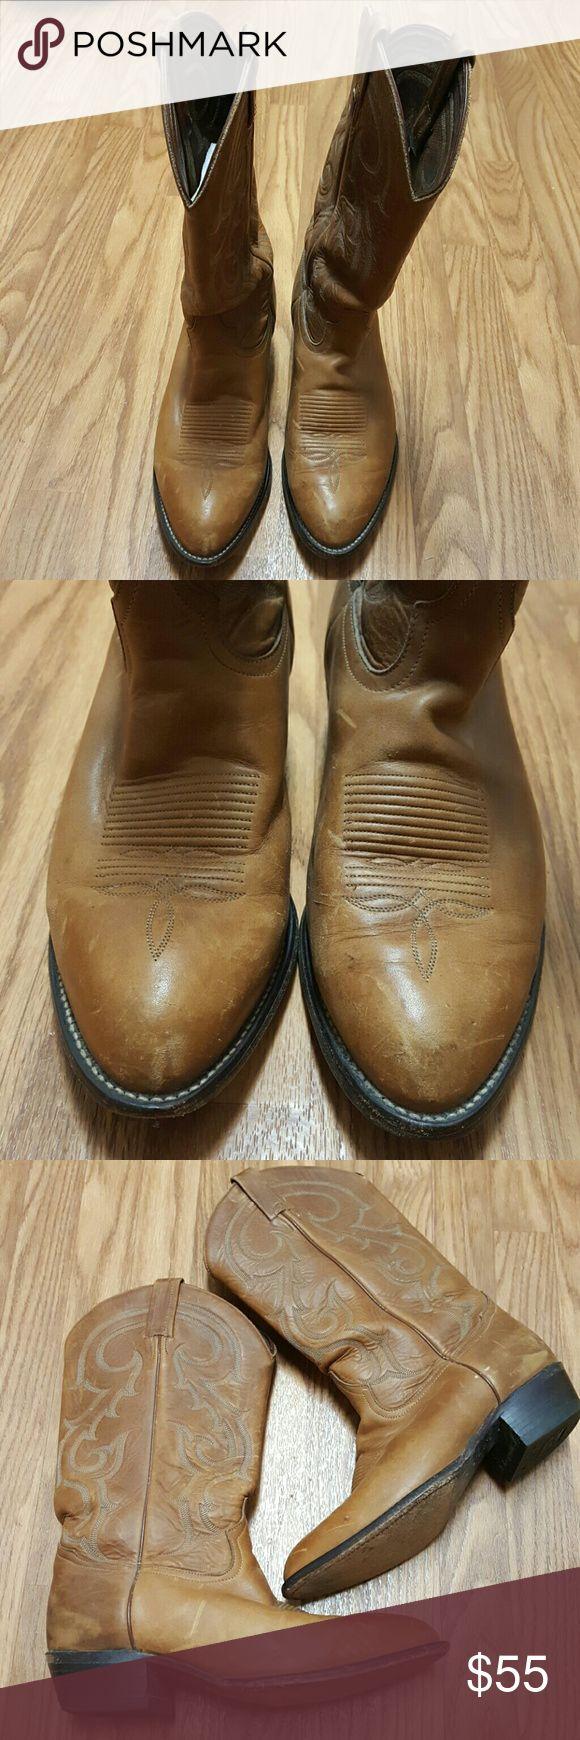 Tony Lama Men's Western Boots.  Size 10 EE Tony Lama Men's Western Boots.  Size 10EE. Very worn. But in good condition. Tony Lama Shoes Cowboy & Western Boots